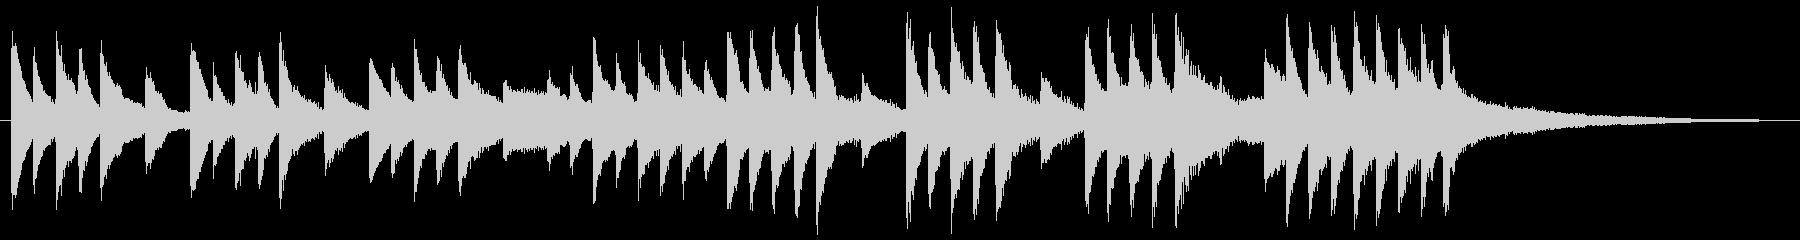 Crying piano jingle's unreproduced waveform